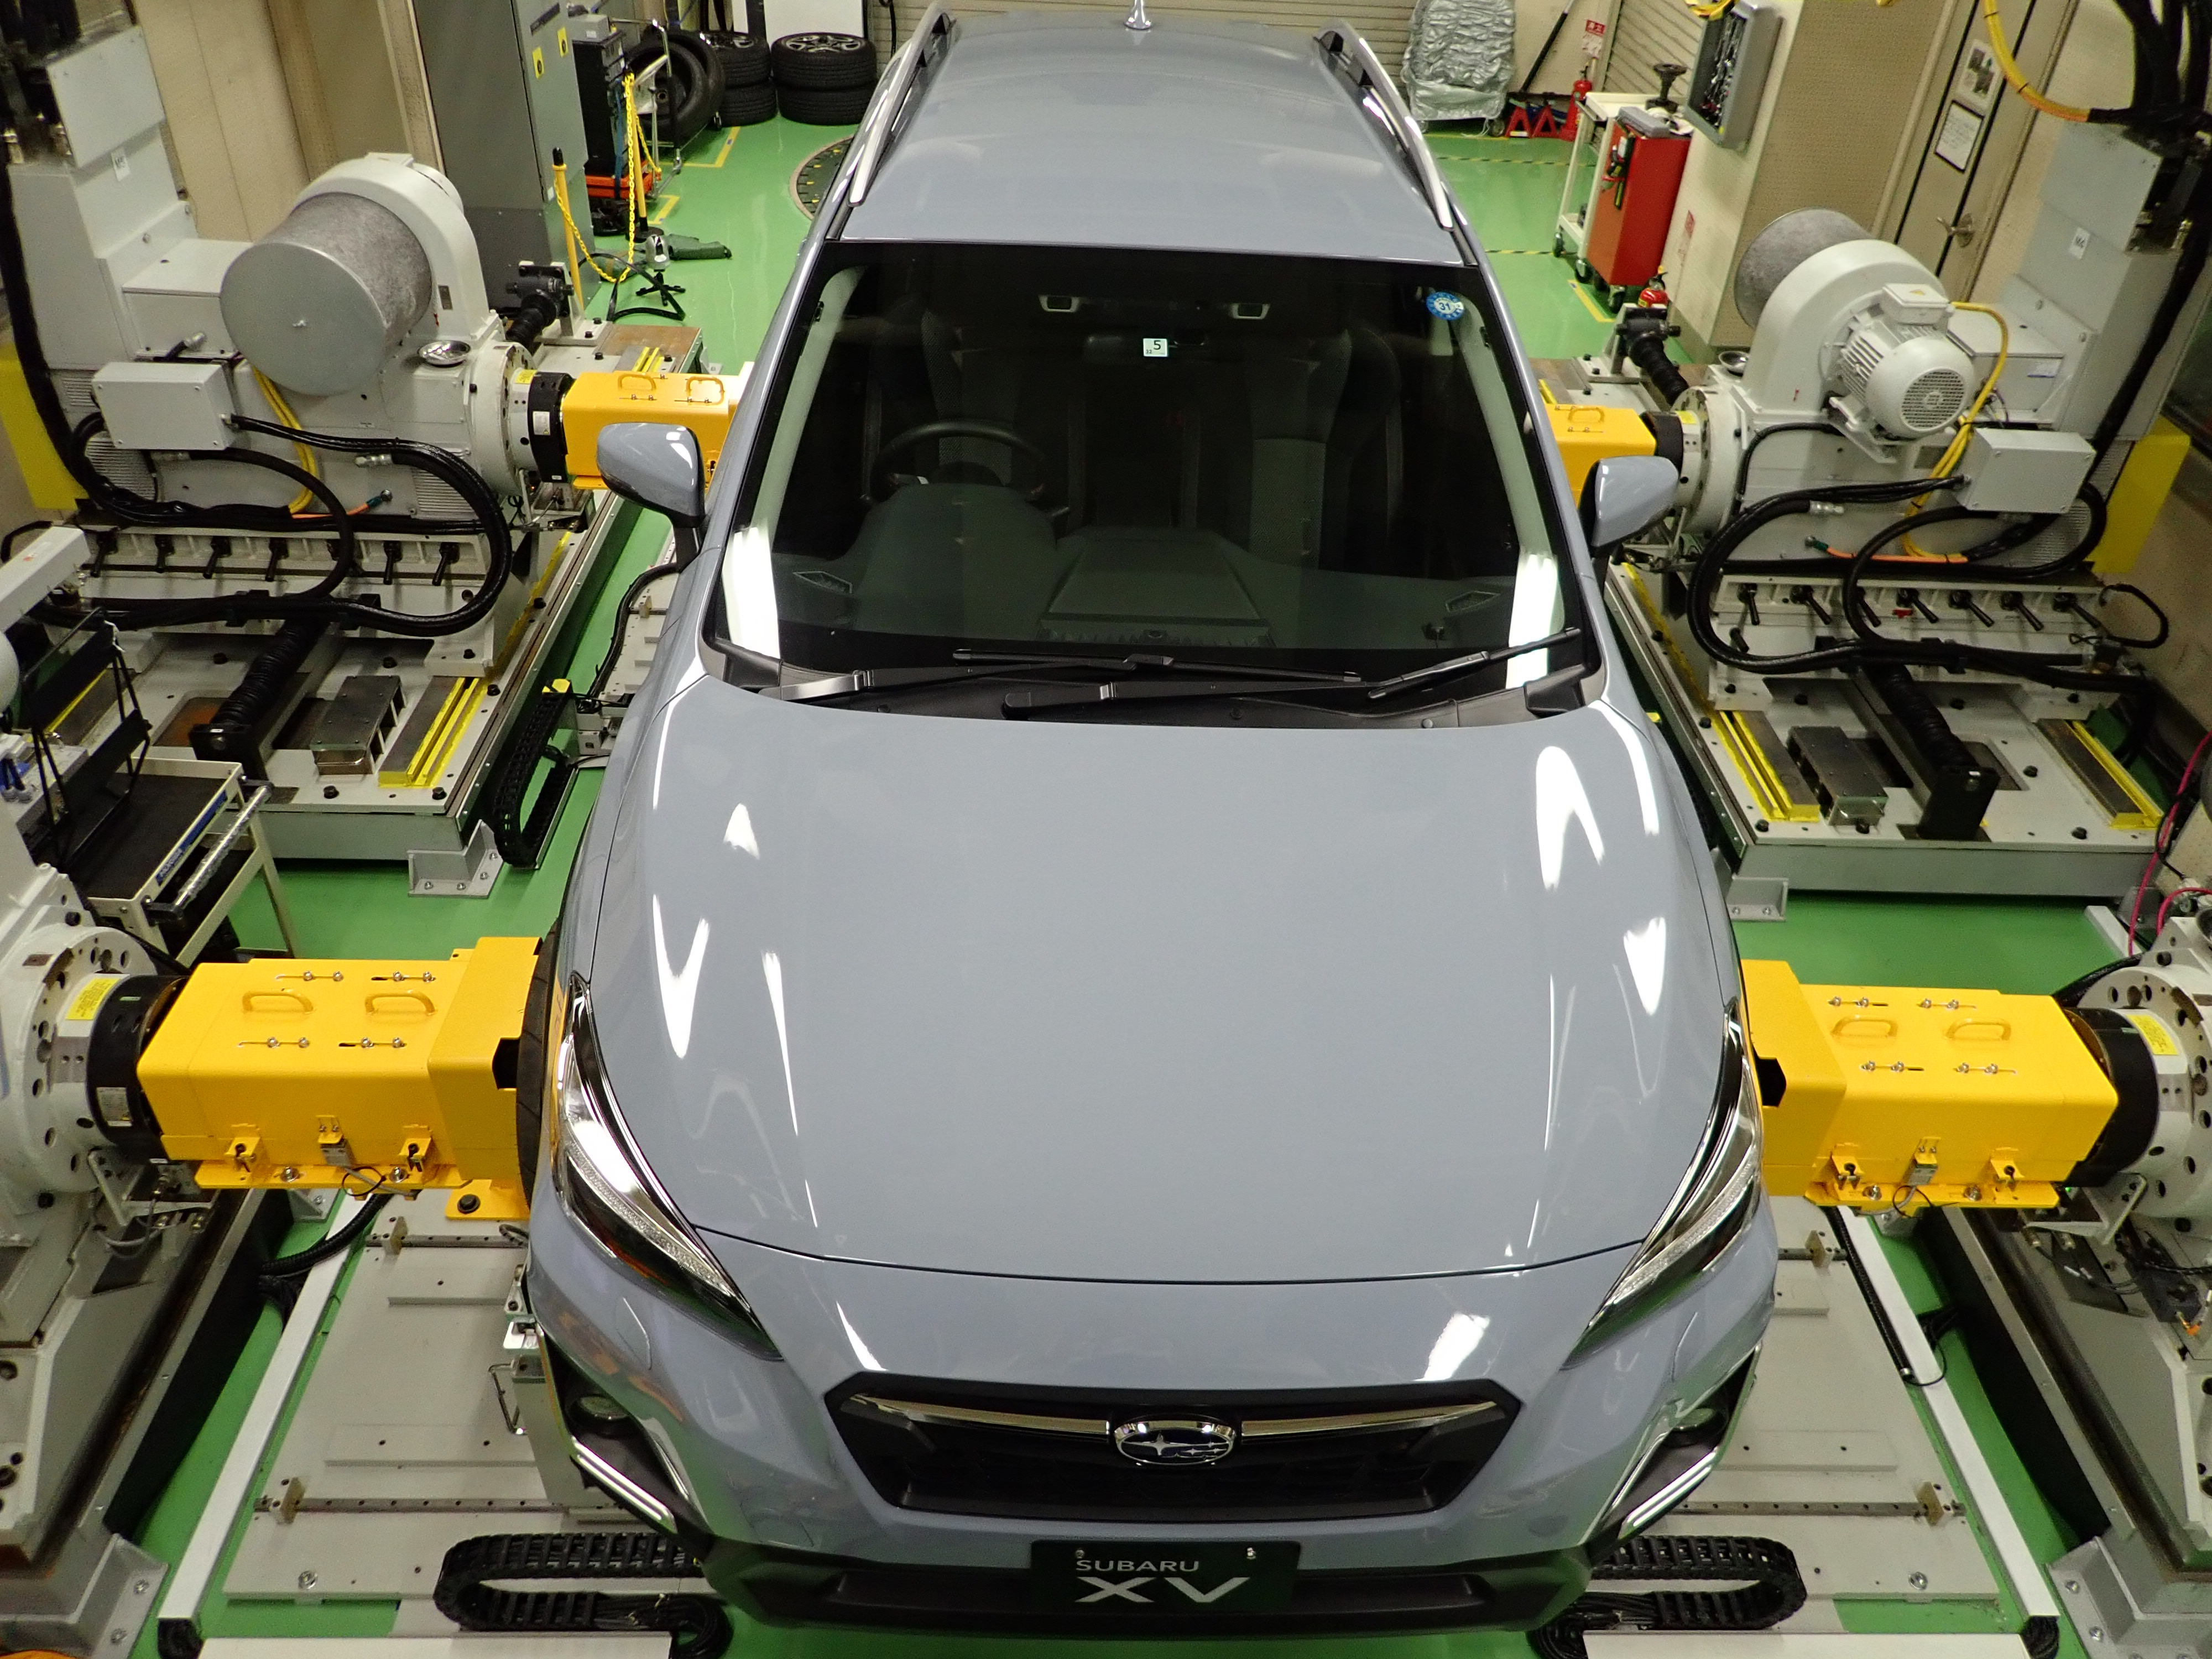 NI Technology Helps Subaru Reduce Electric Vehicle Test Development ...